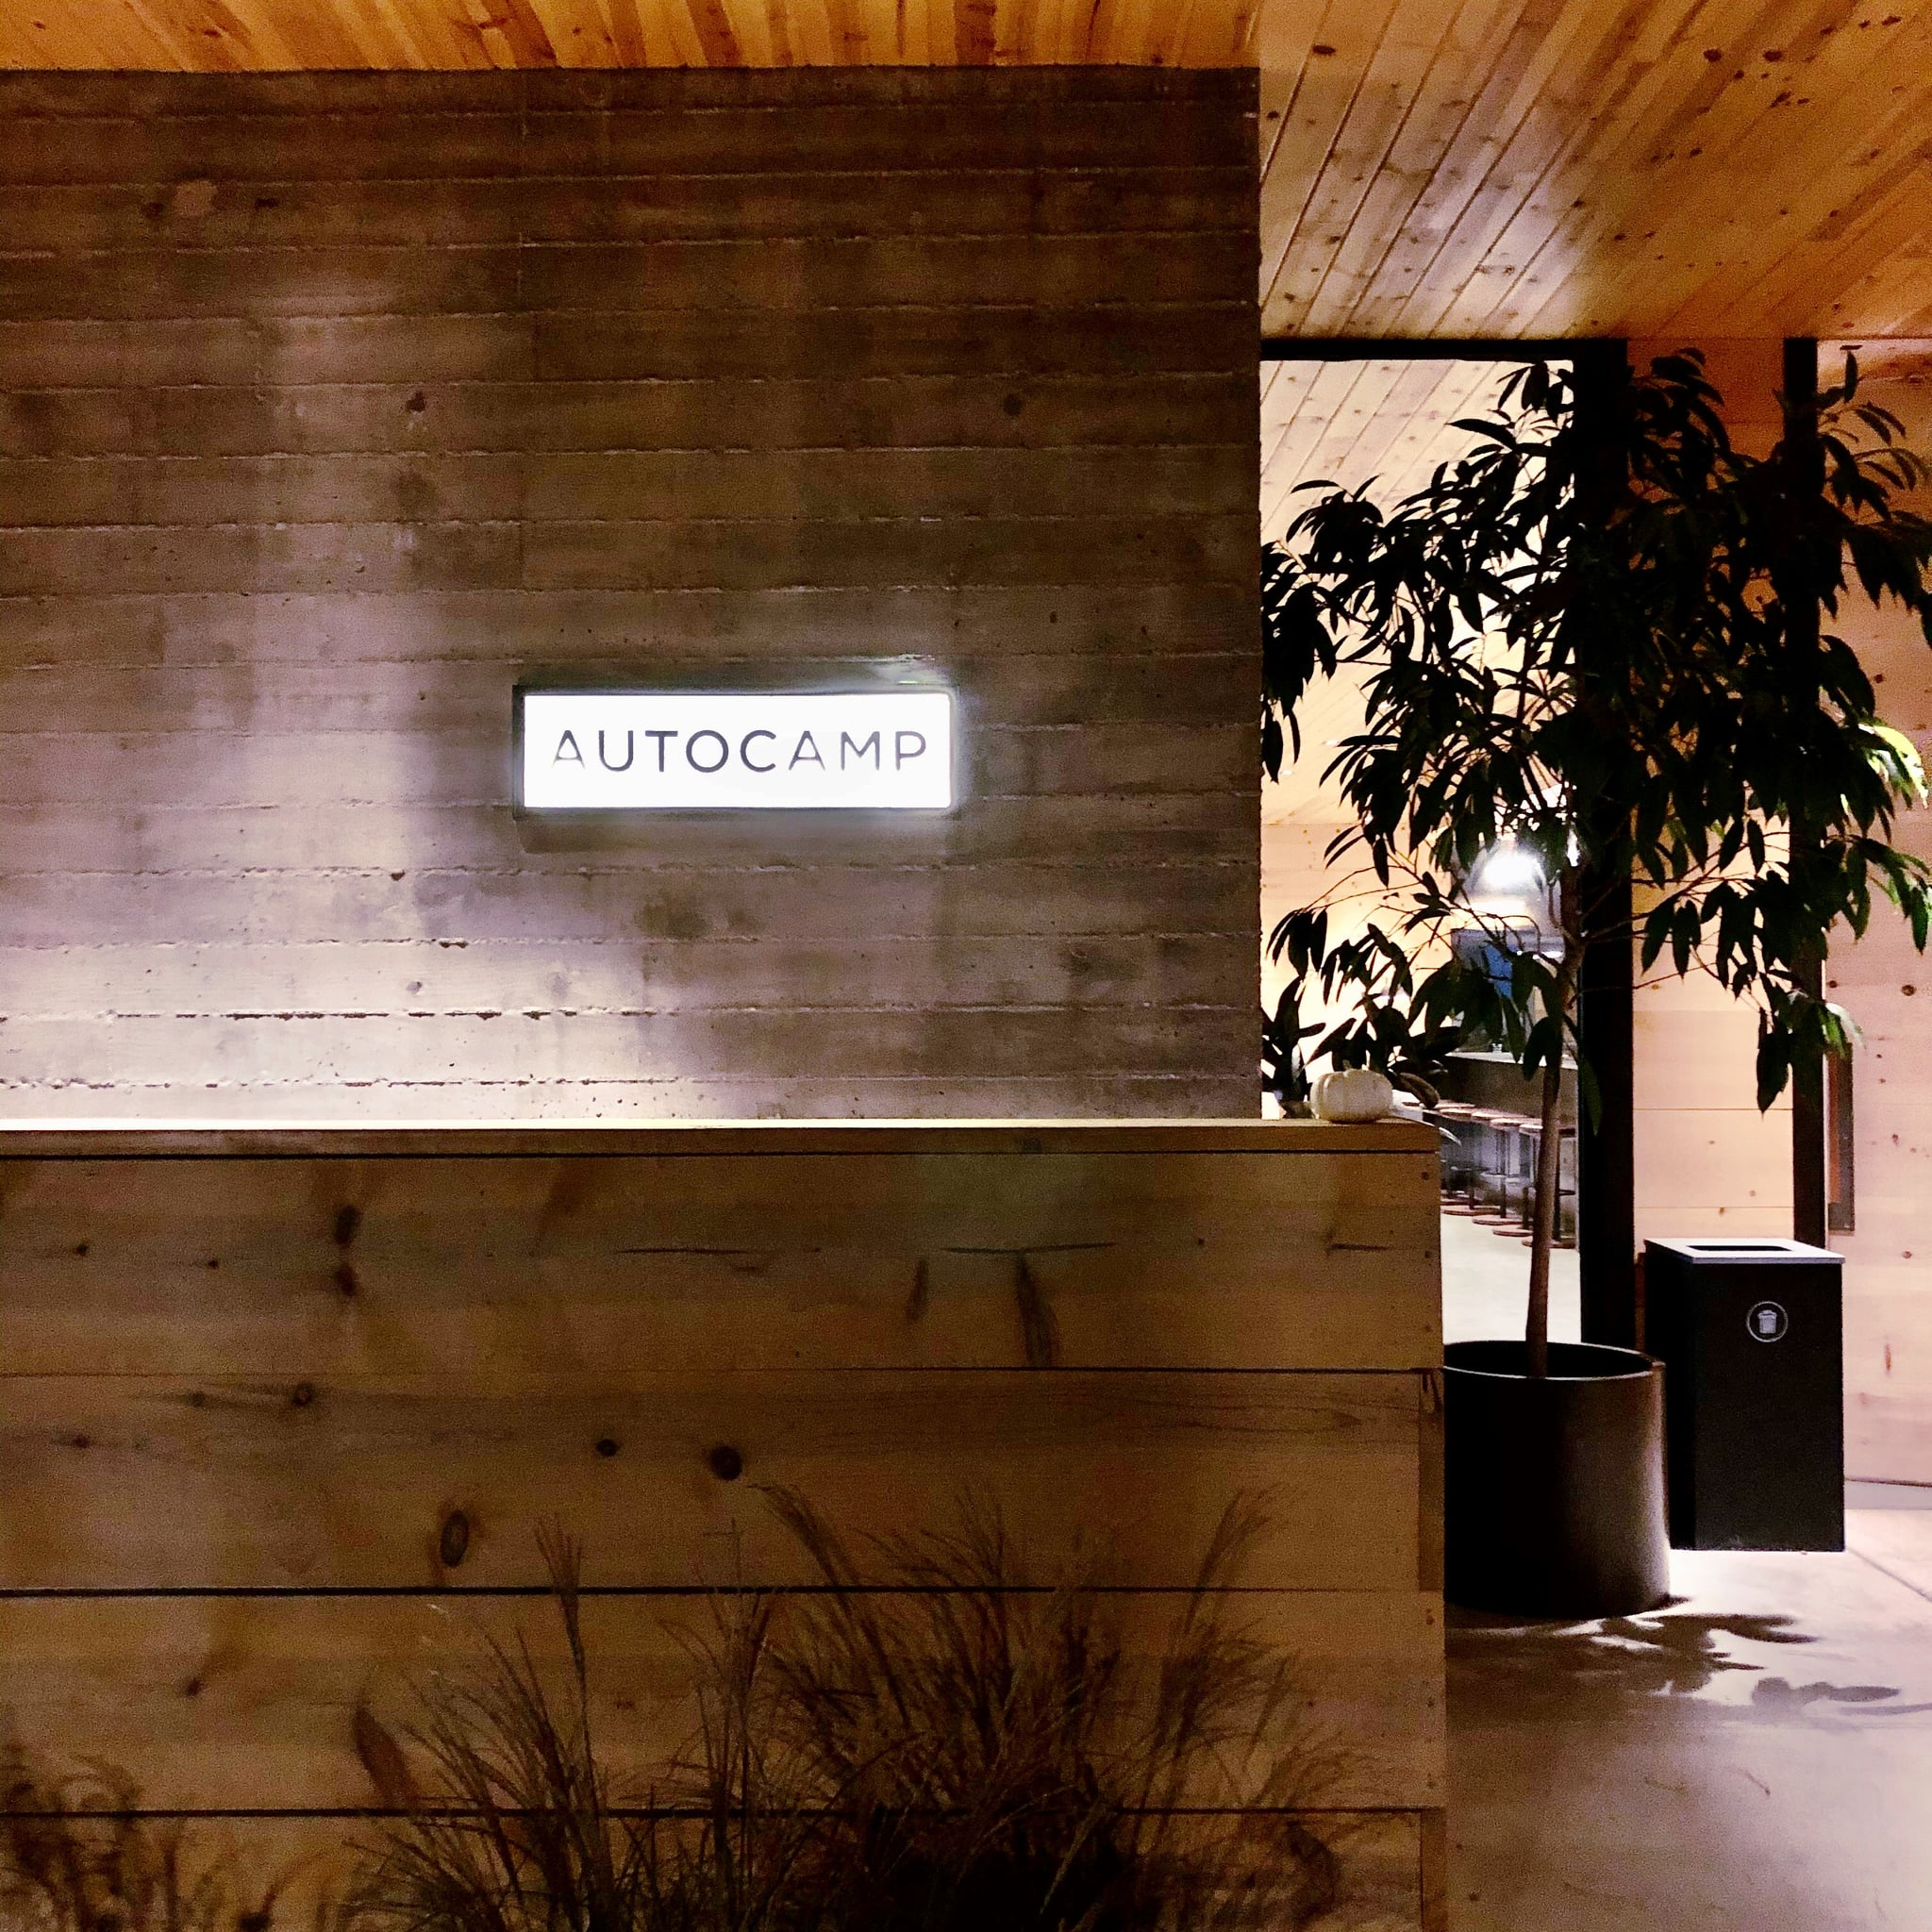 I Stayed at AutoCamp Yosemite, and It Was Amazing | POPSUGAR Australia Smart Living